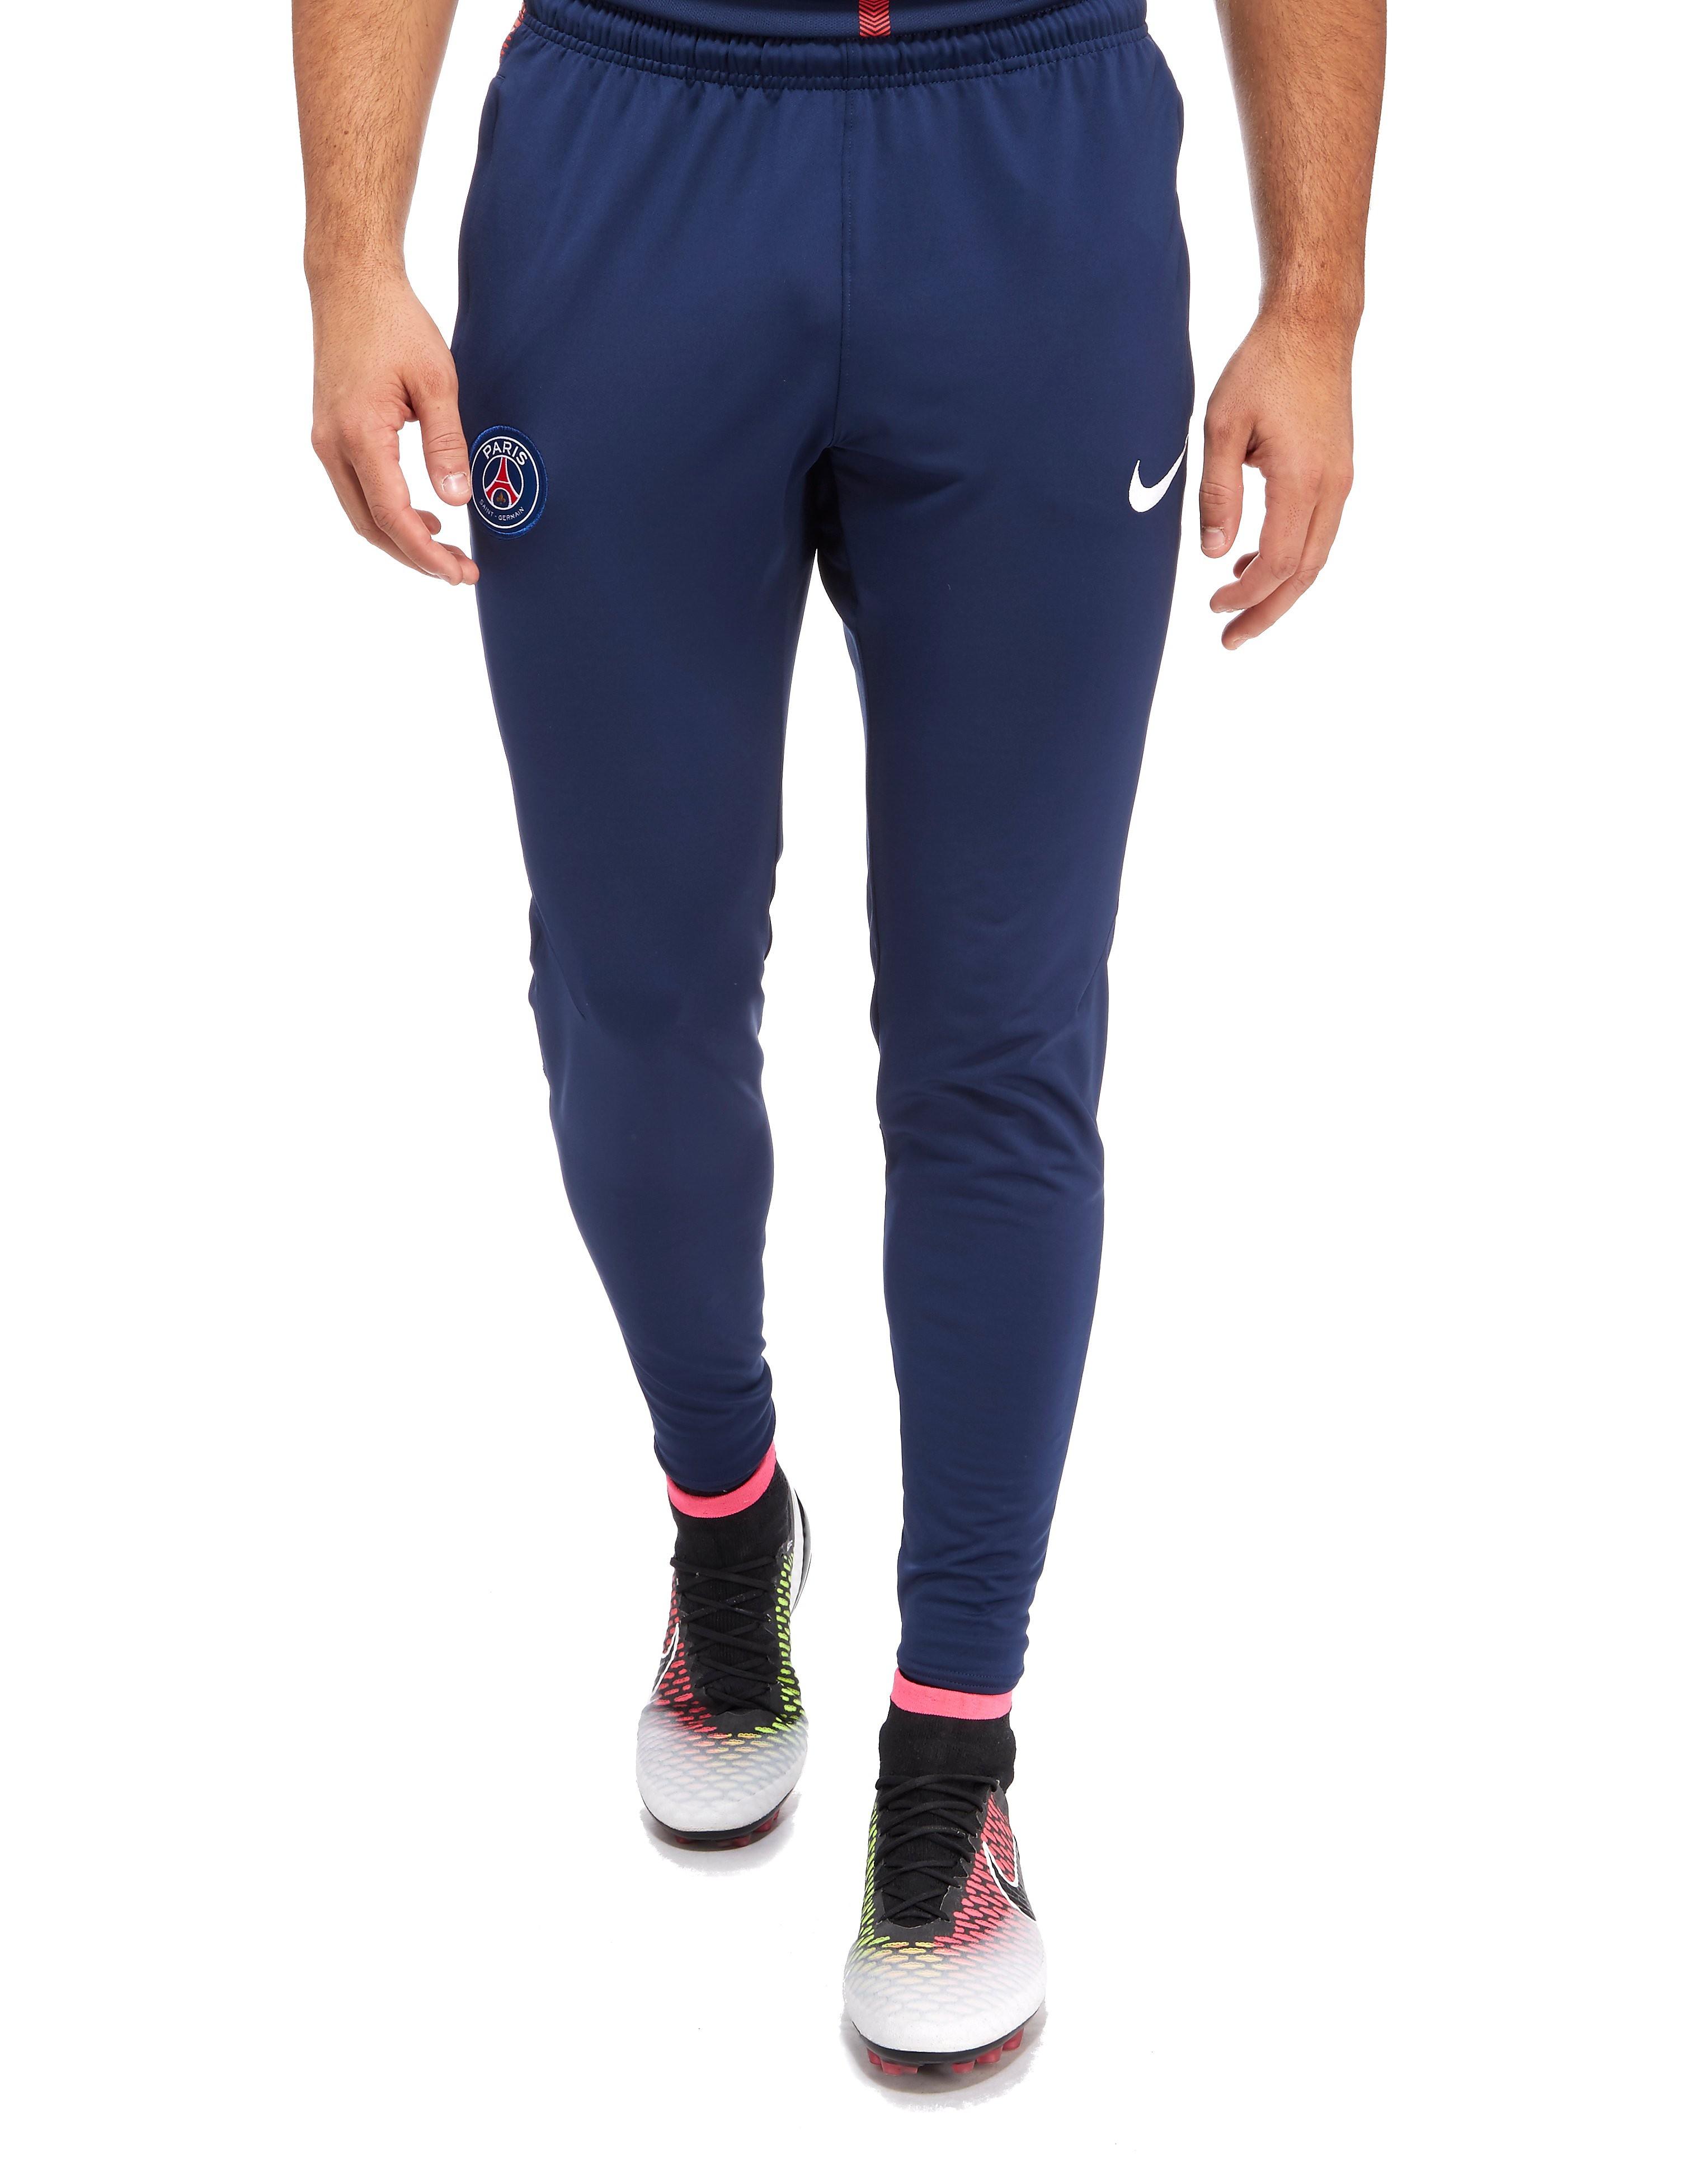 Nike Pantalon Paris Saint Germain 2017/18 Squad Homme